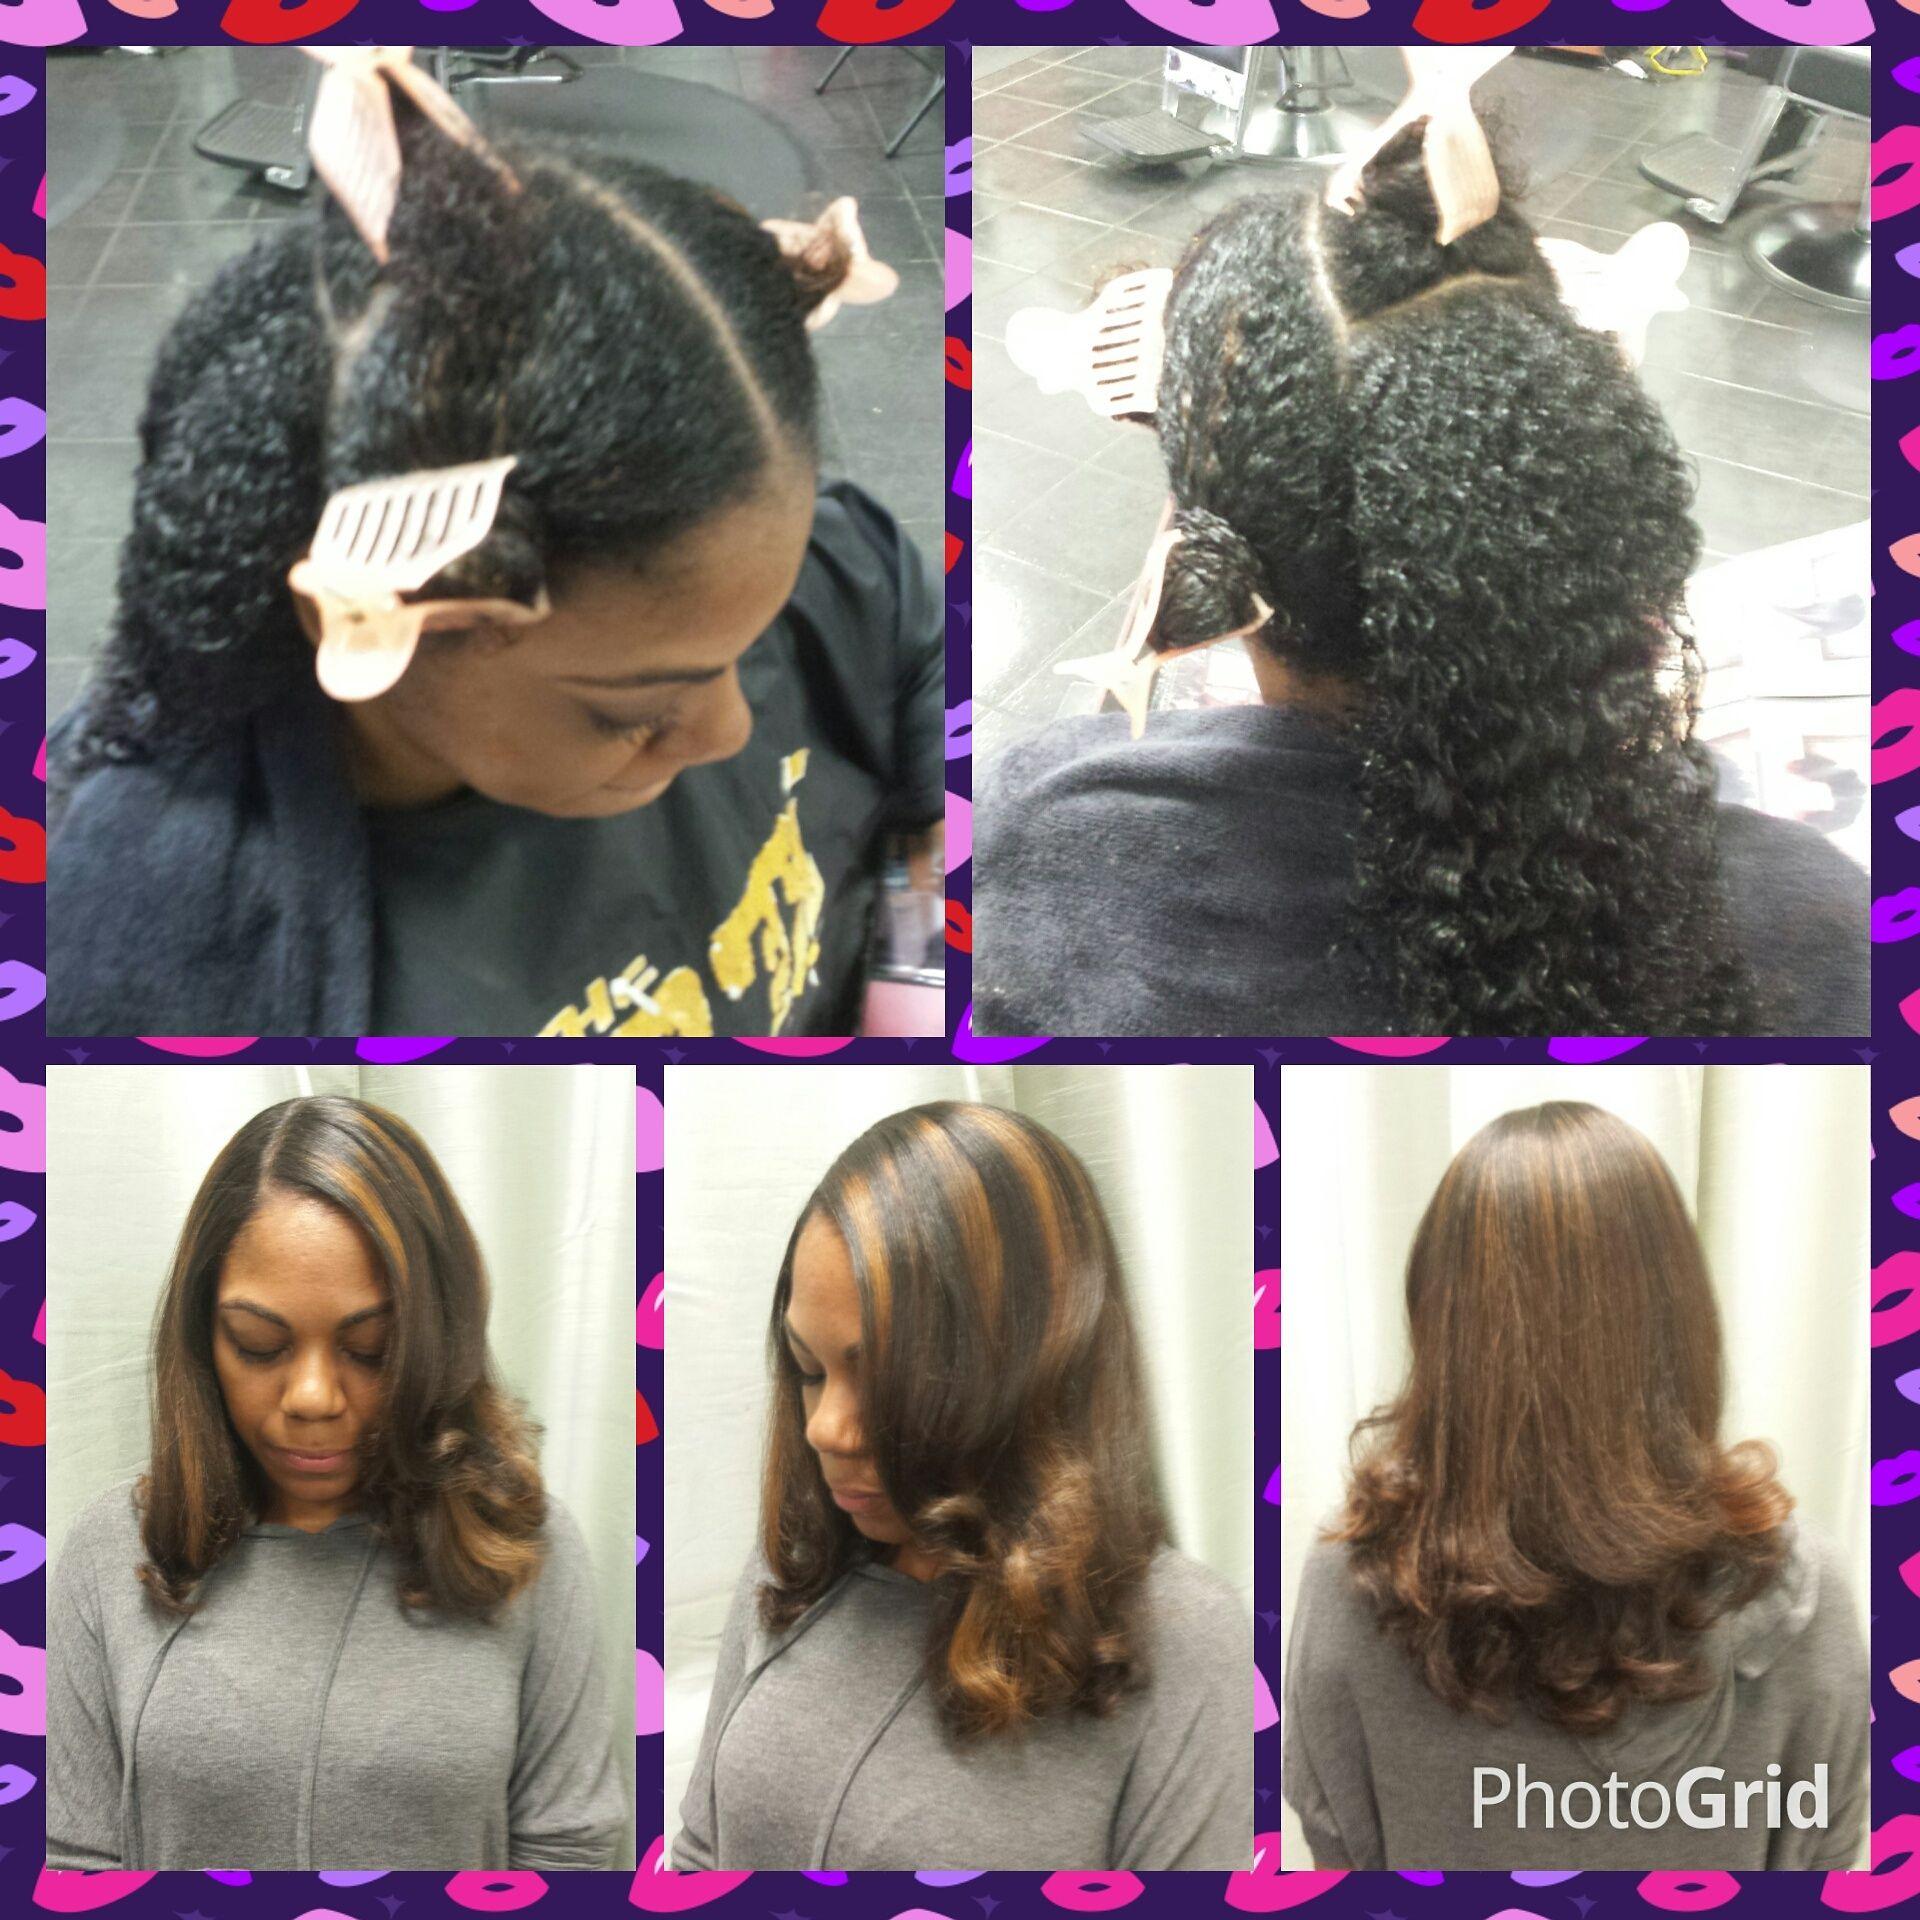 Hair coloring on natural hair at Trendz by Tammy Hair Salon ...